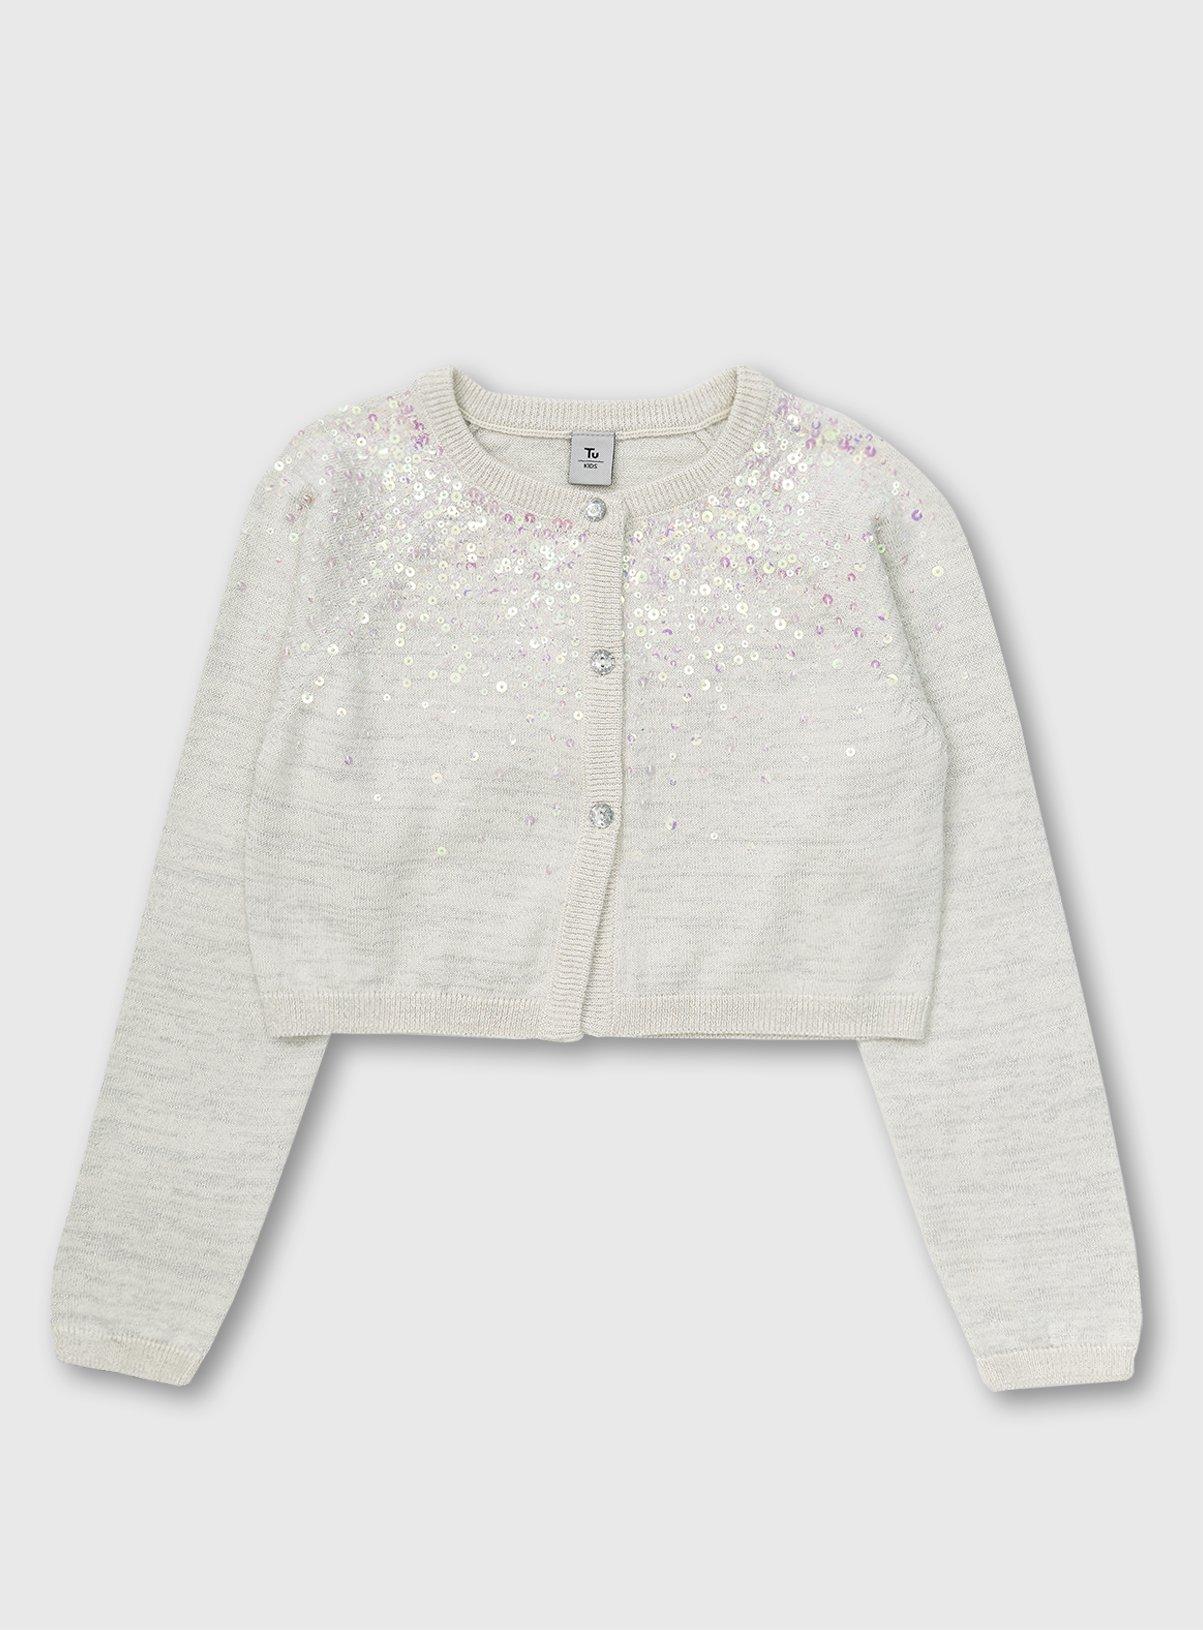 White Glitter Yoke Long Sleeve Bolero - 8 years